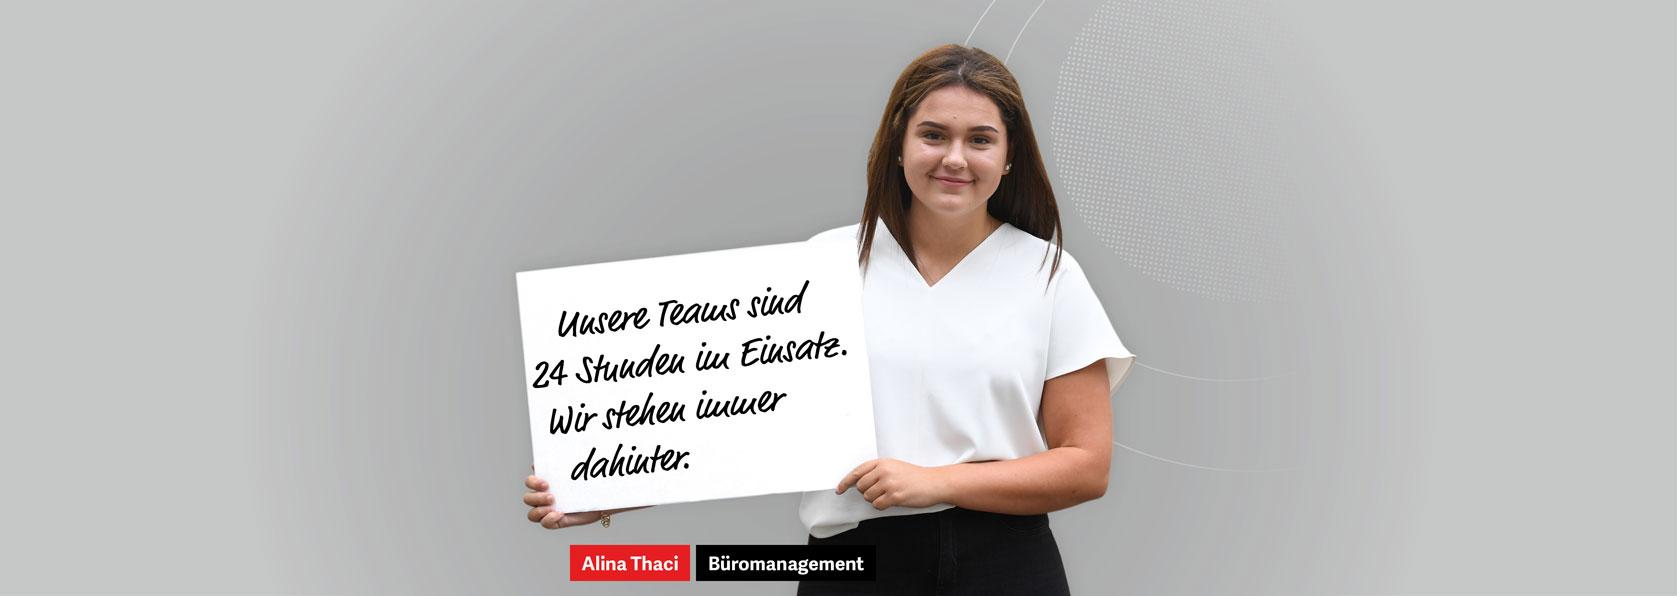 slider_alina_thaci